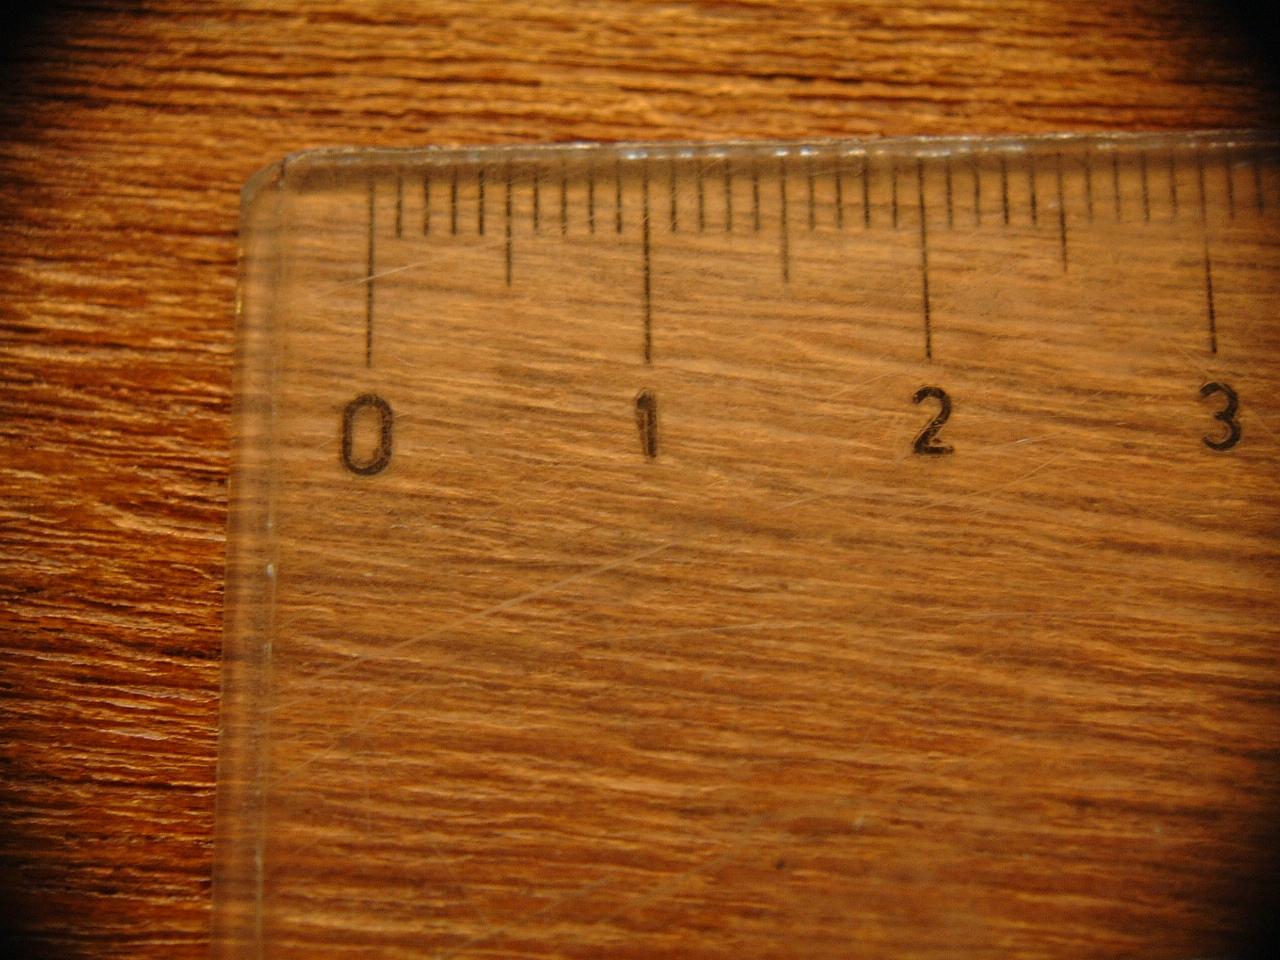 maartent ruler macro numbers sanserif wood texture